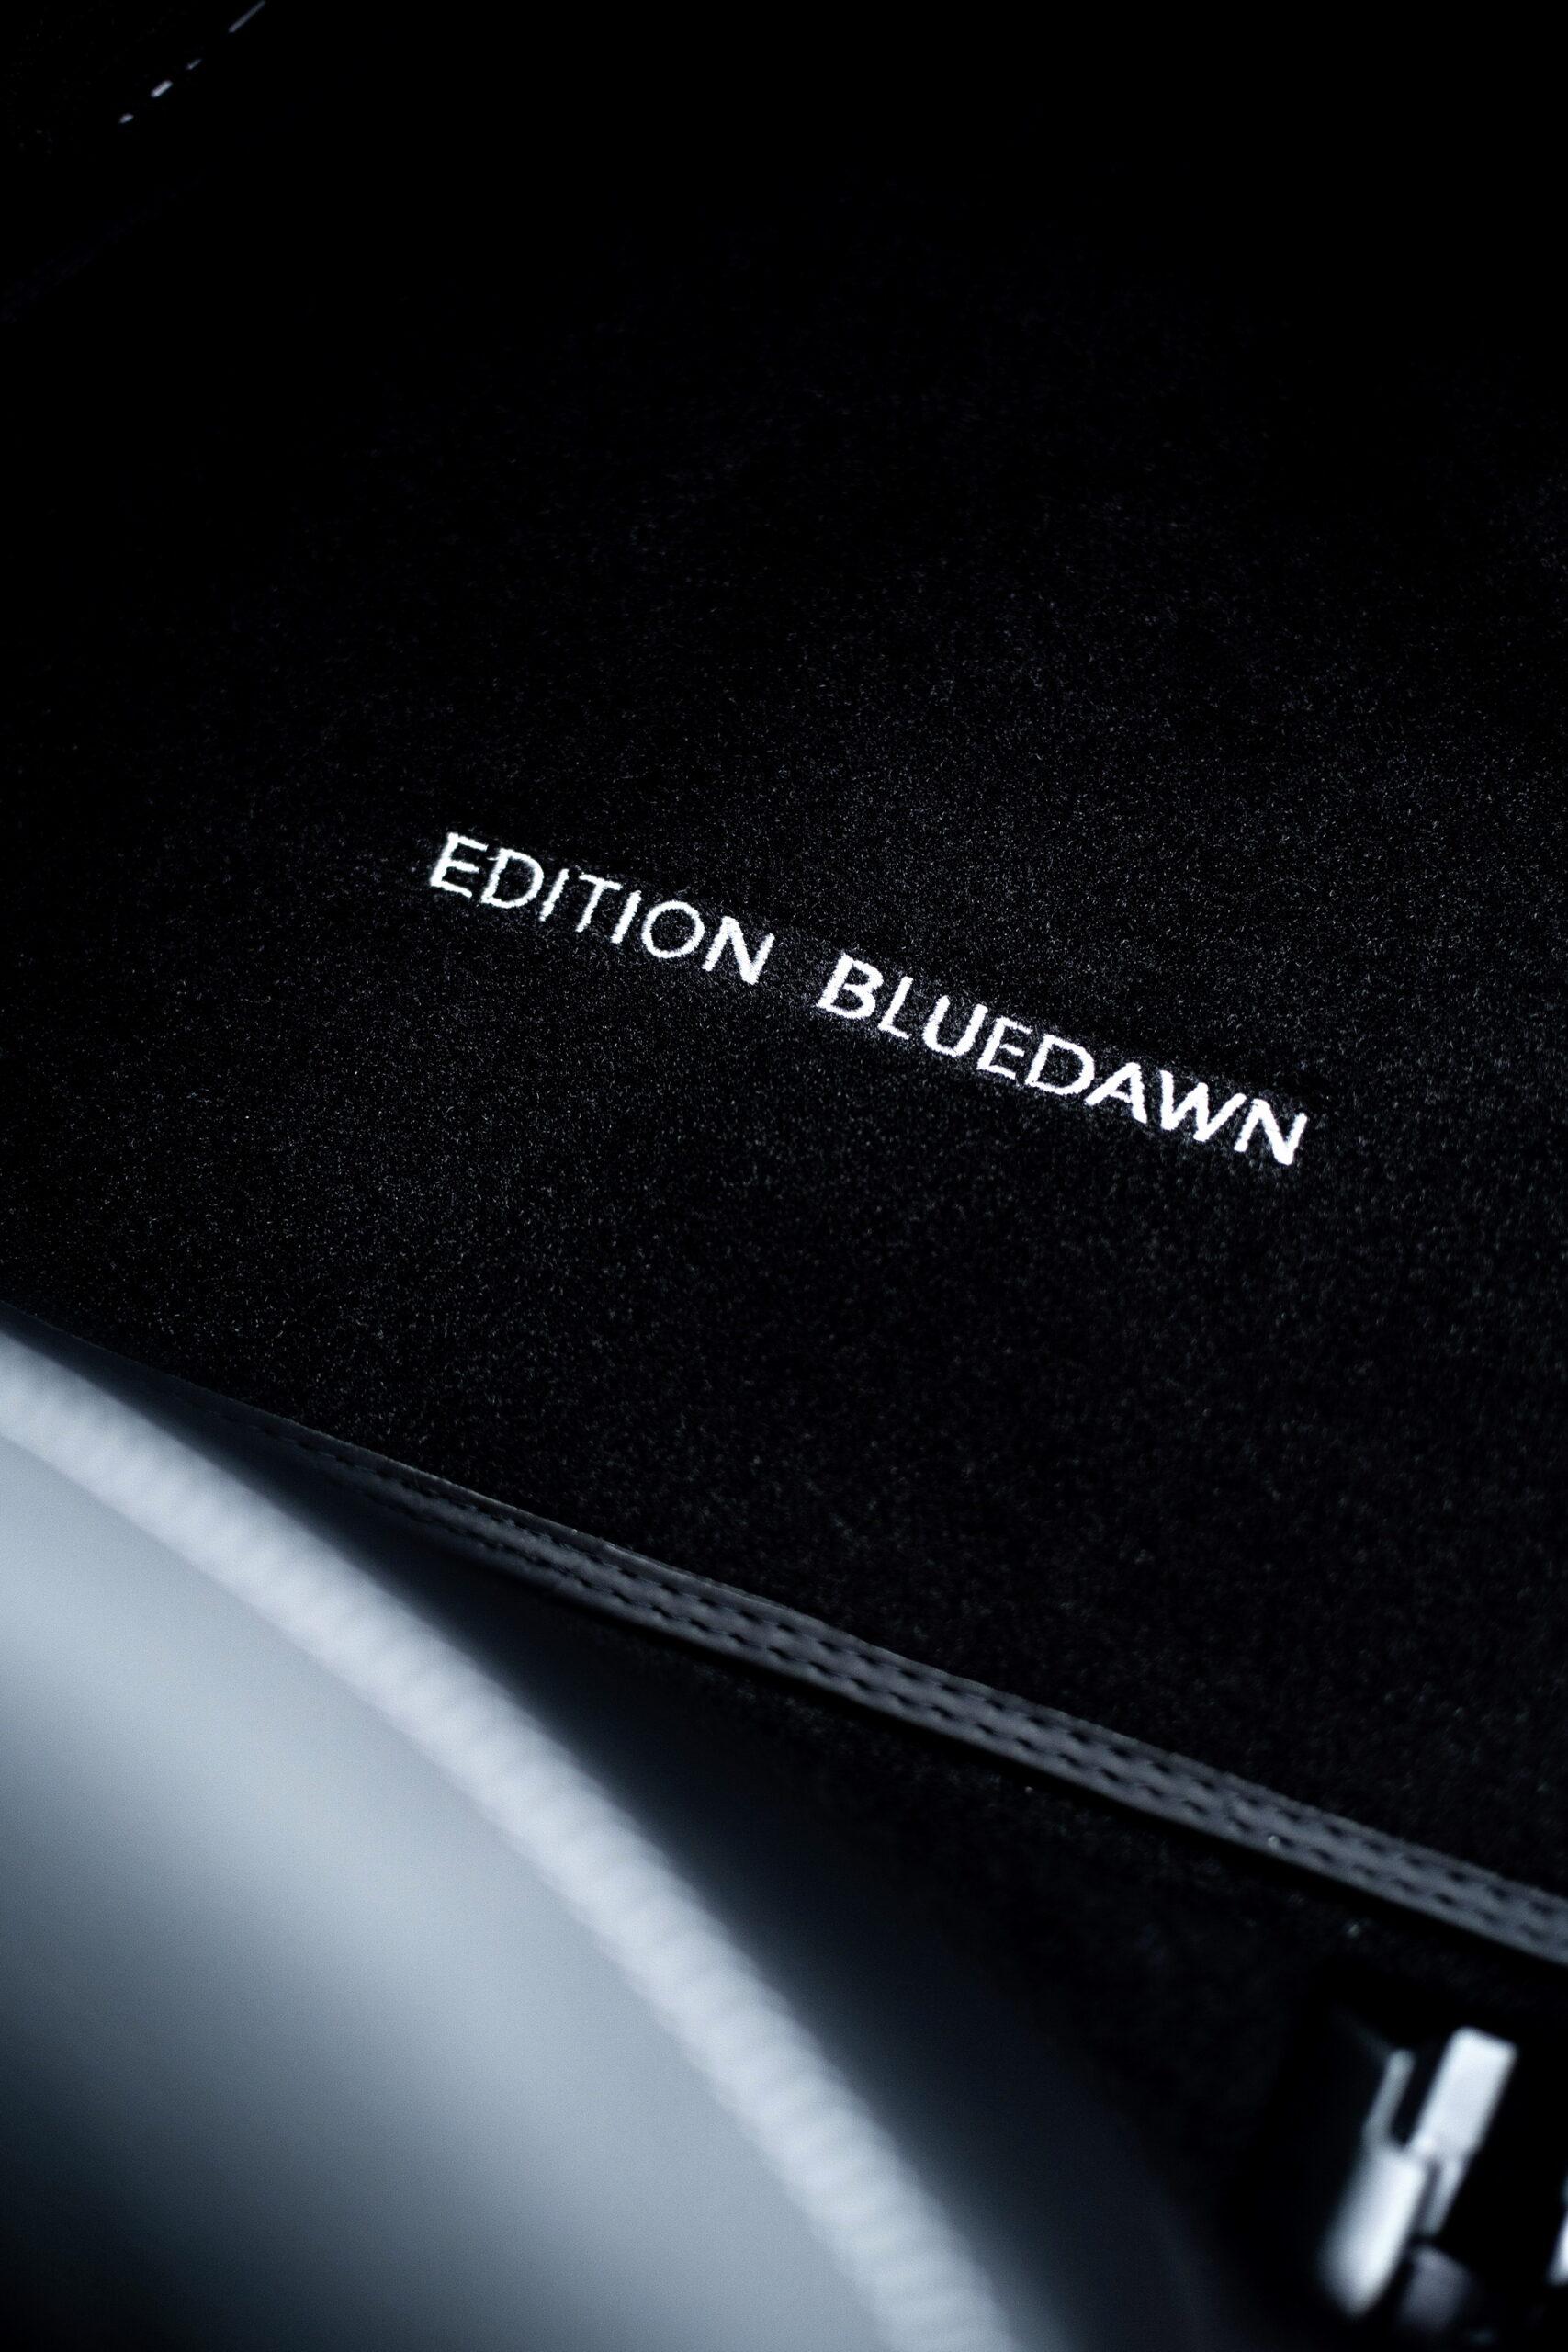 Smart EQ ForTwo Edition BlueDawn (2)